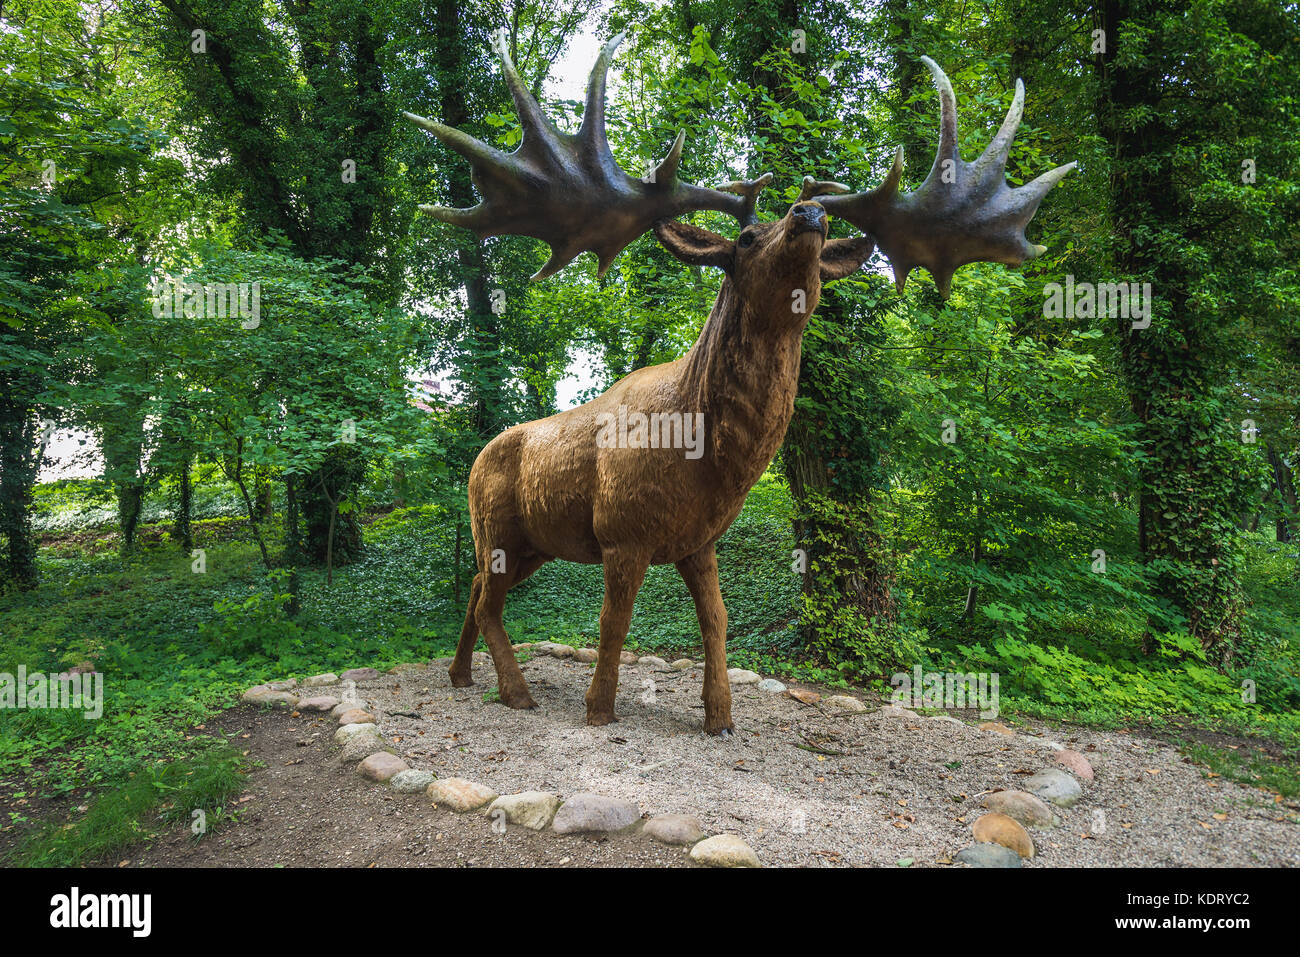 Model of extinct specie Megaloceros giganteus - Irish elk or Giant deer in geopark called 'Avenue of Pleistocene - Stock Image